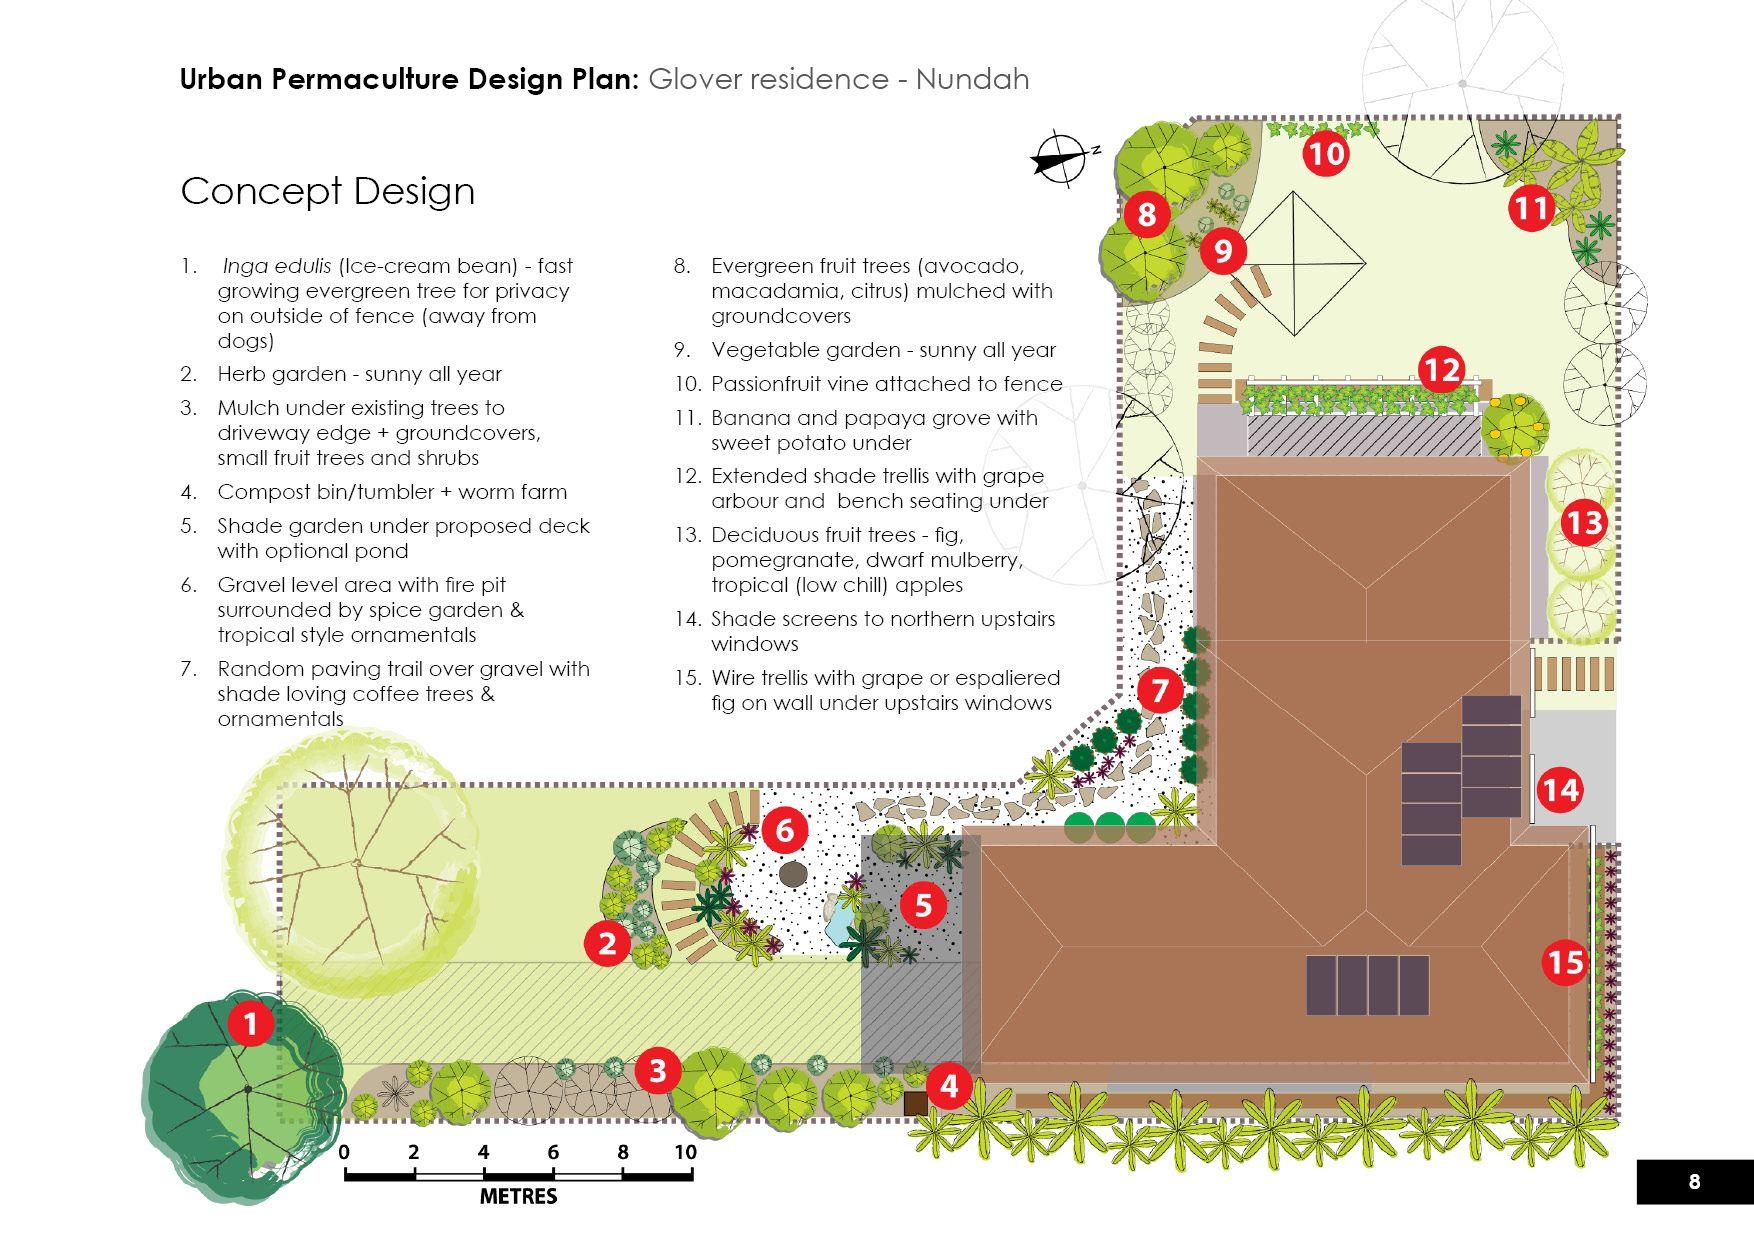 Urban Permaculture Design Concept For Glover Residence Brisbane